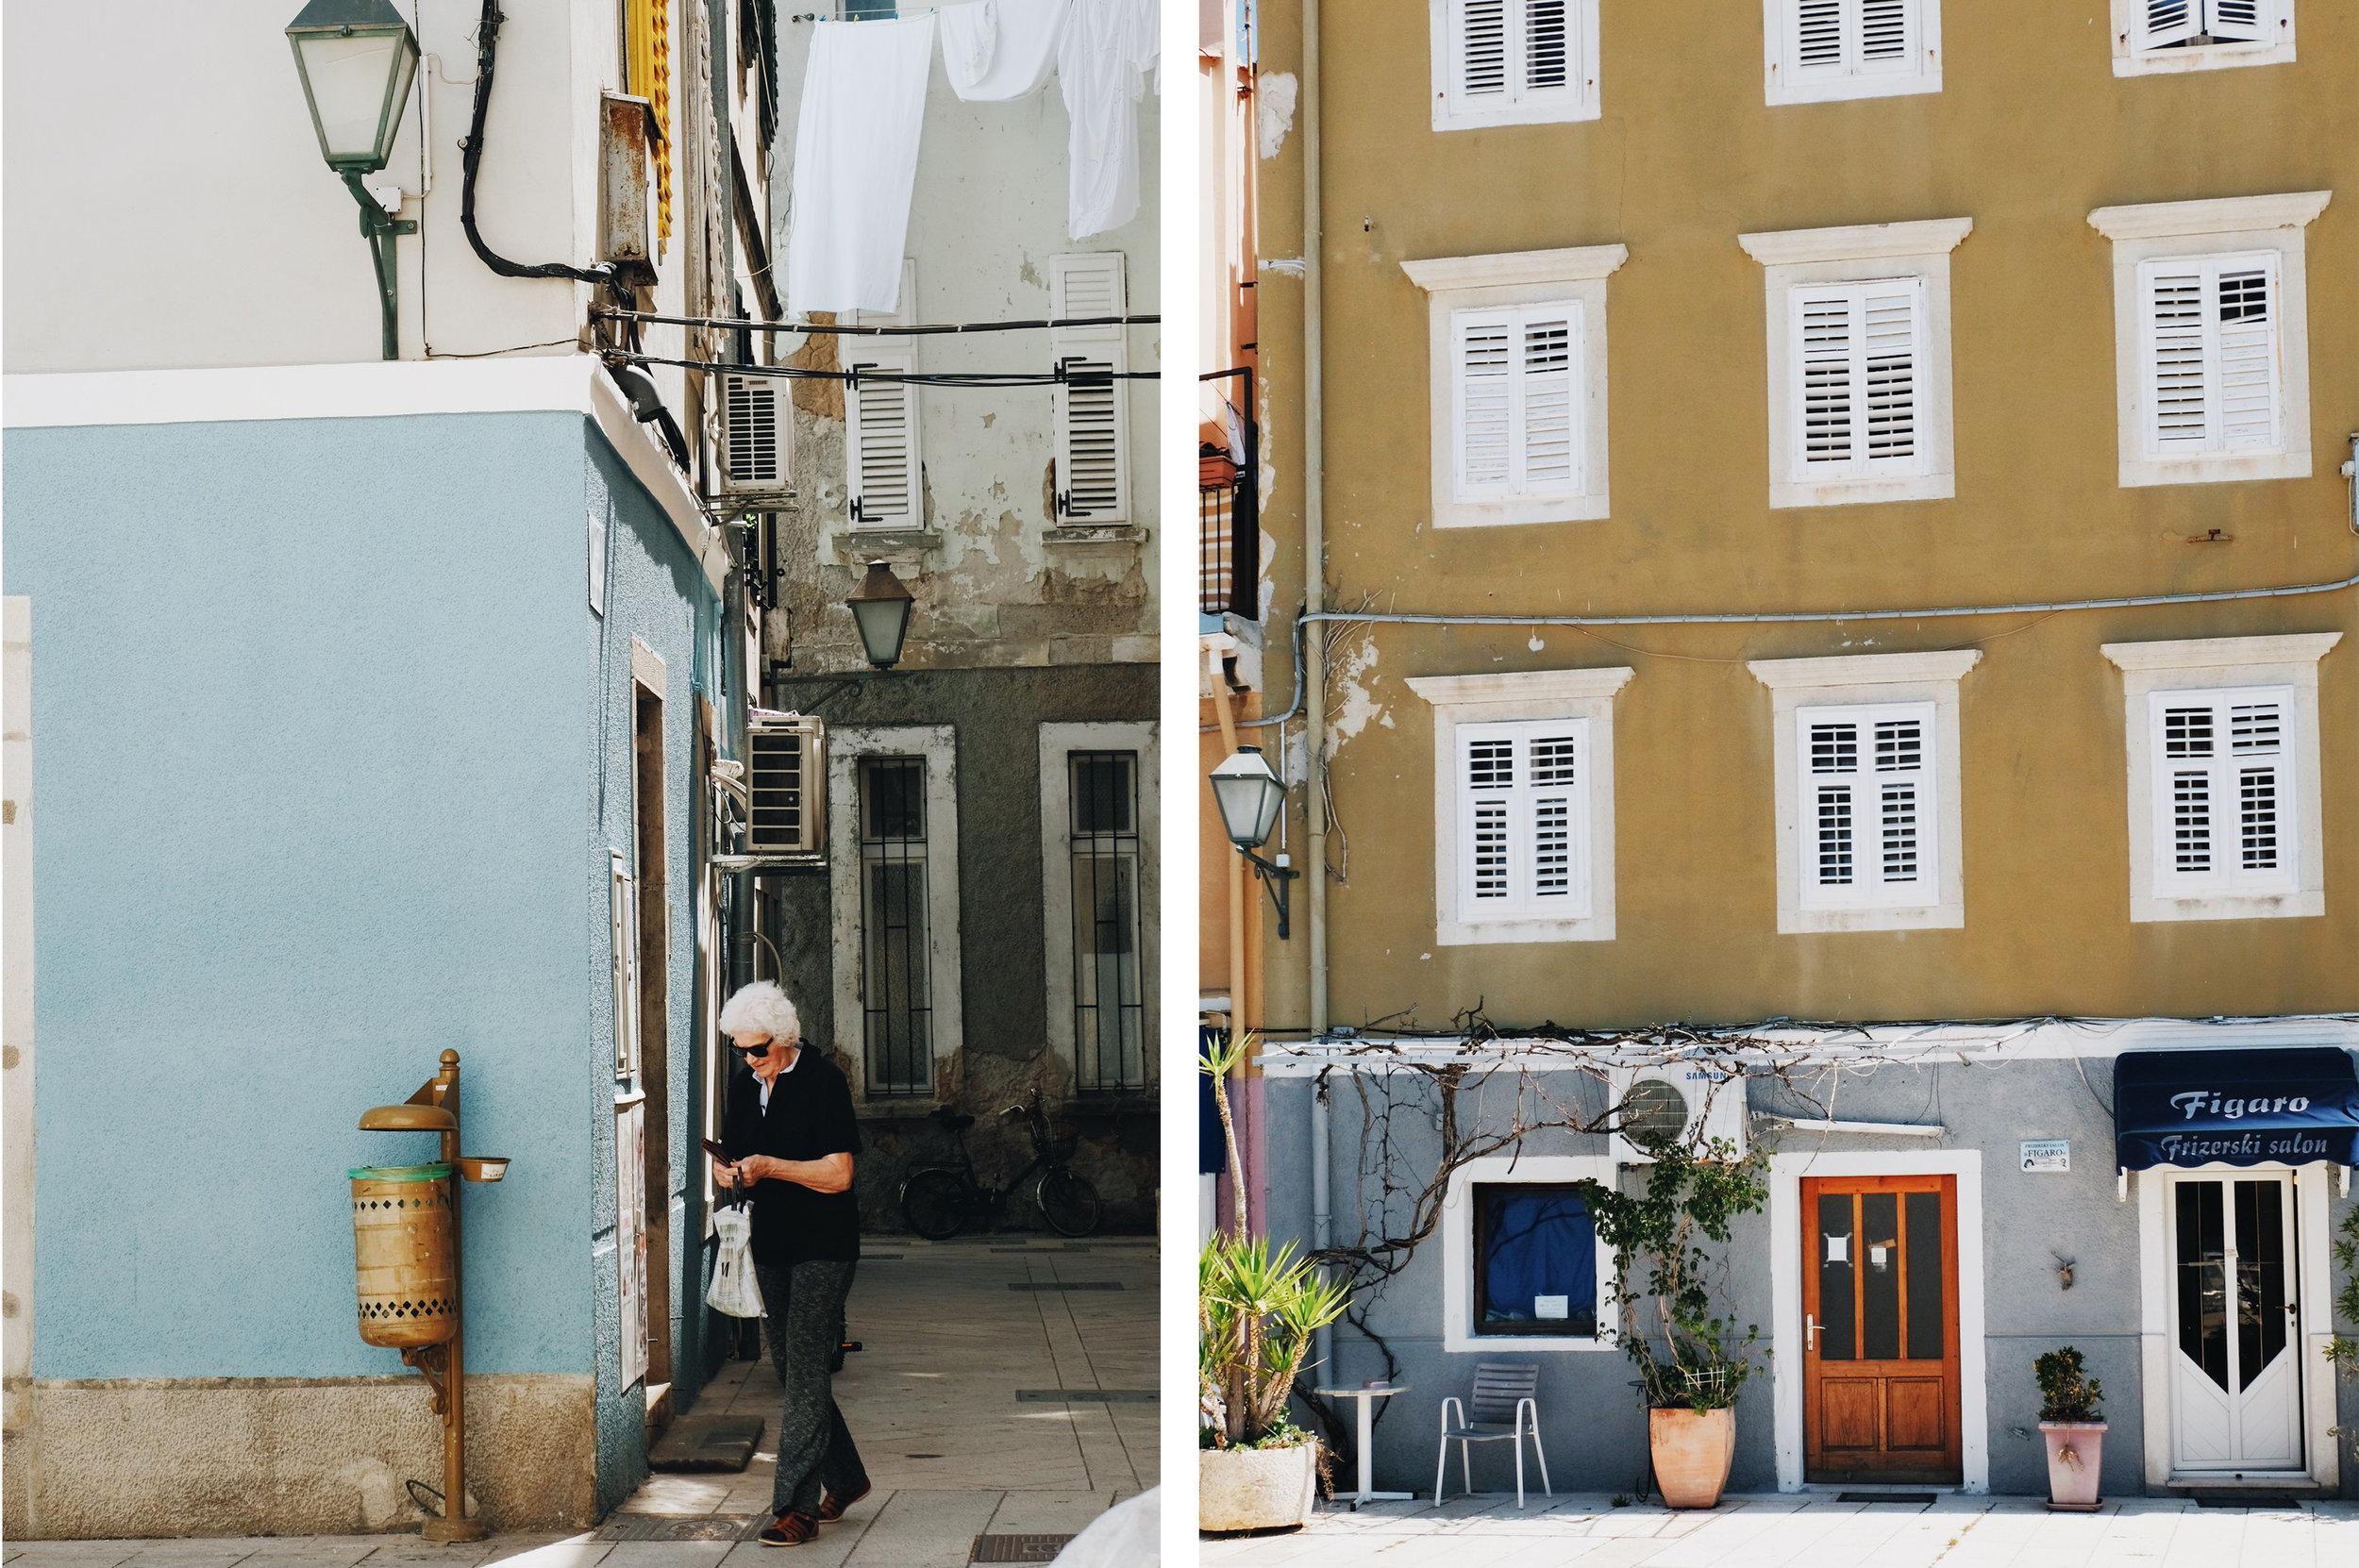 fat-creative-blog-2017-05-Unique-travel-destination- croatian-kvarner-region-cres-losinj-103.jpg